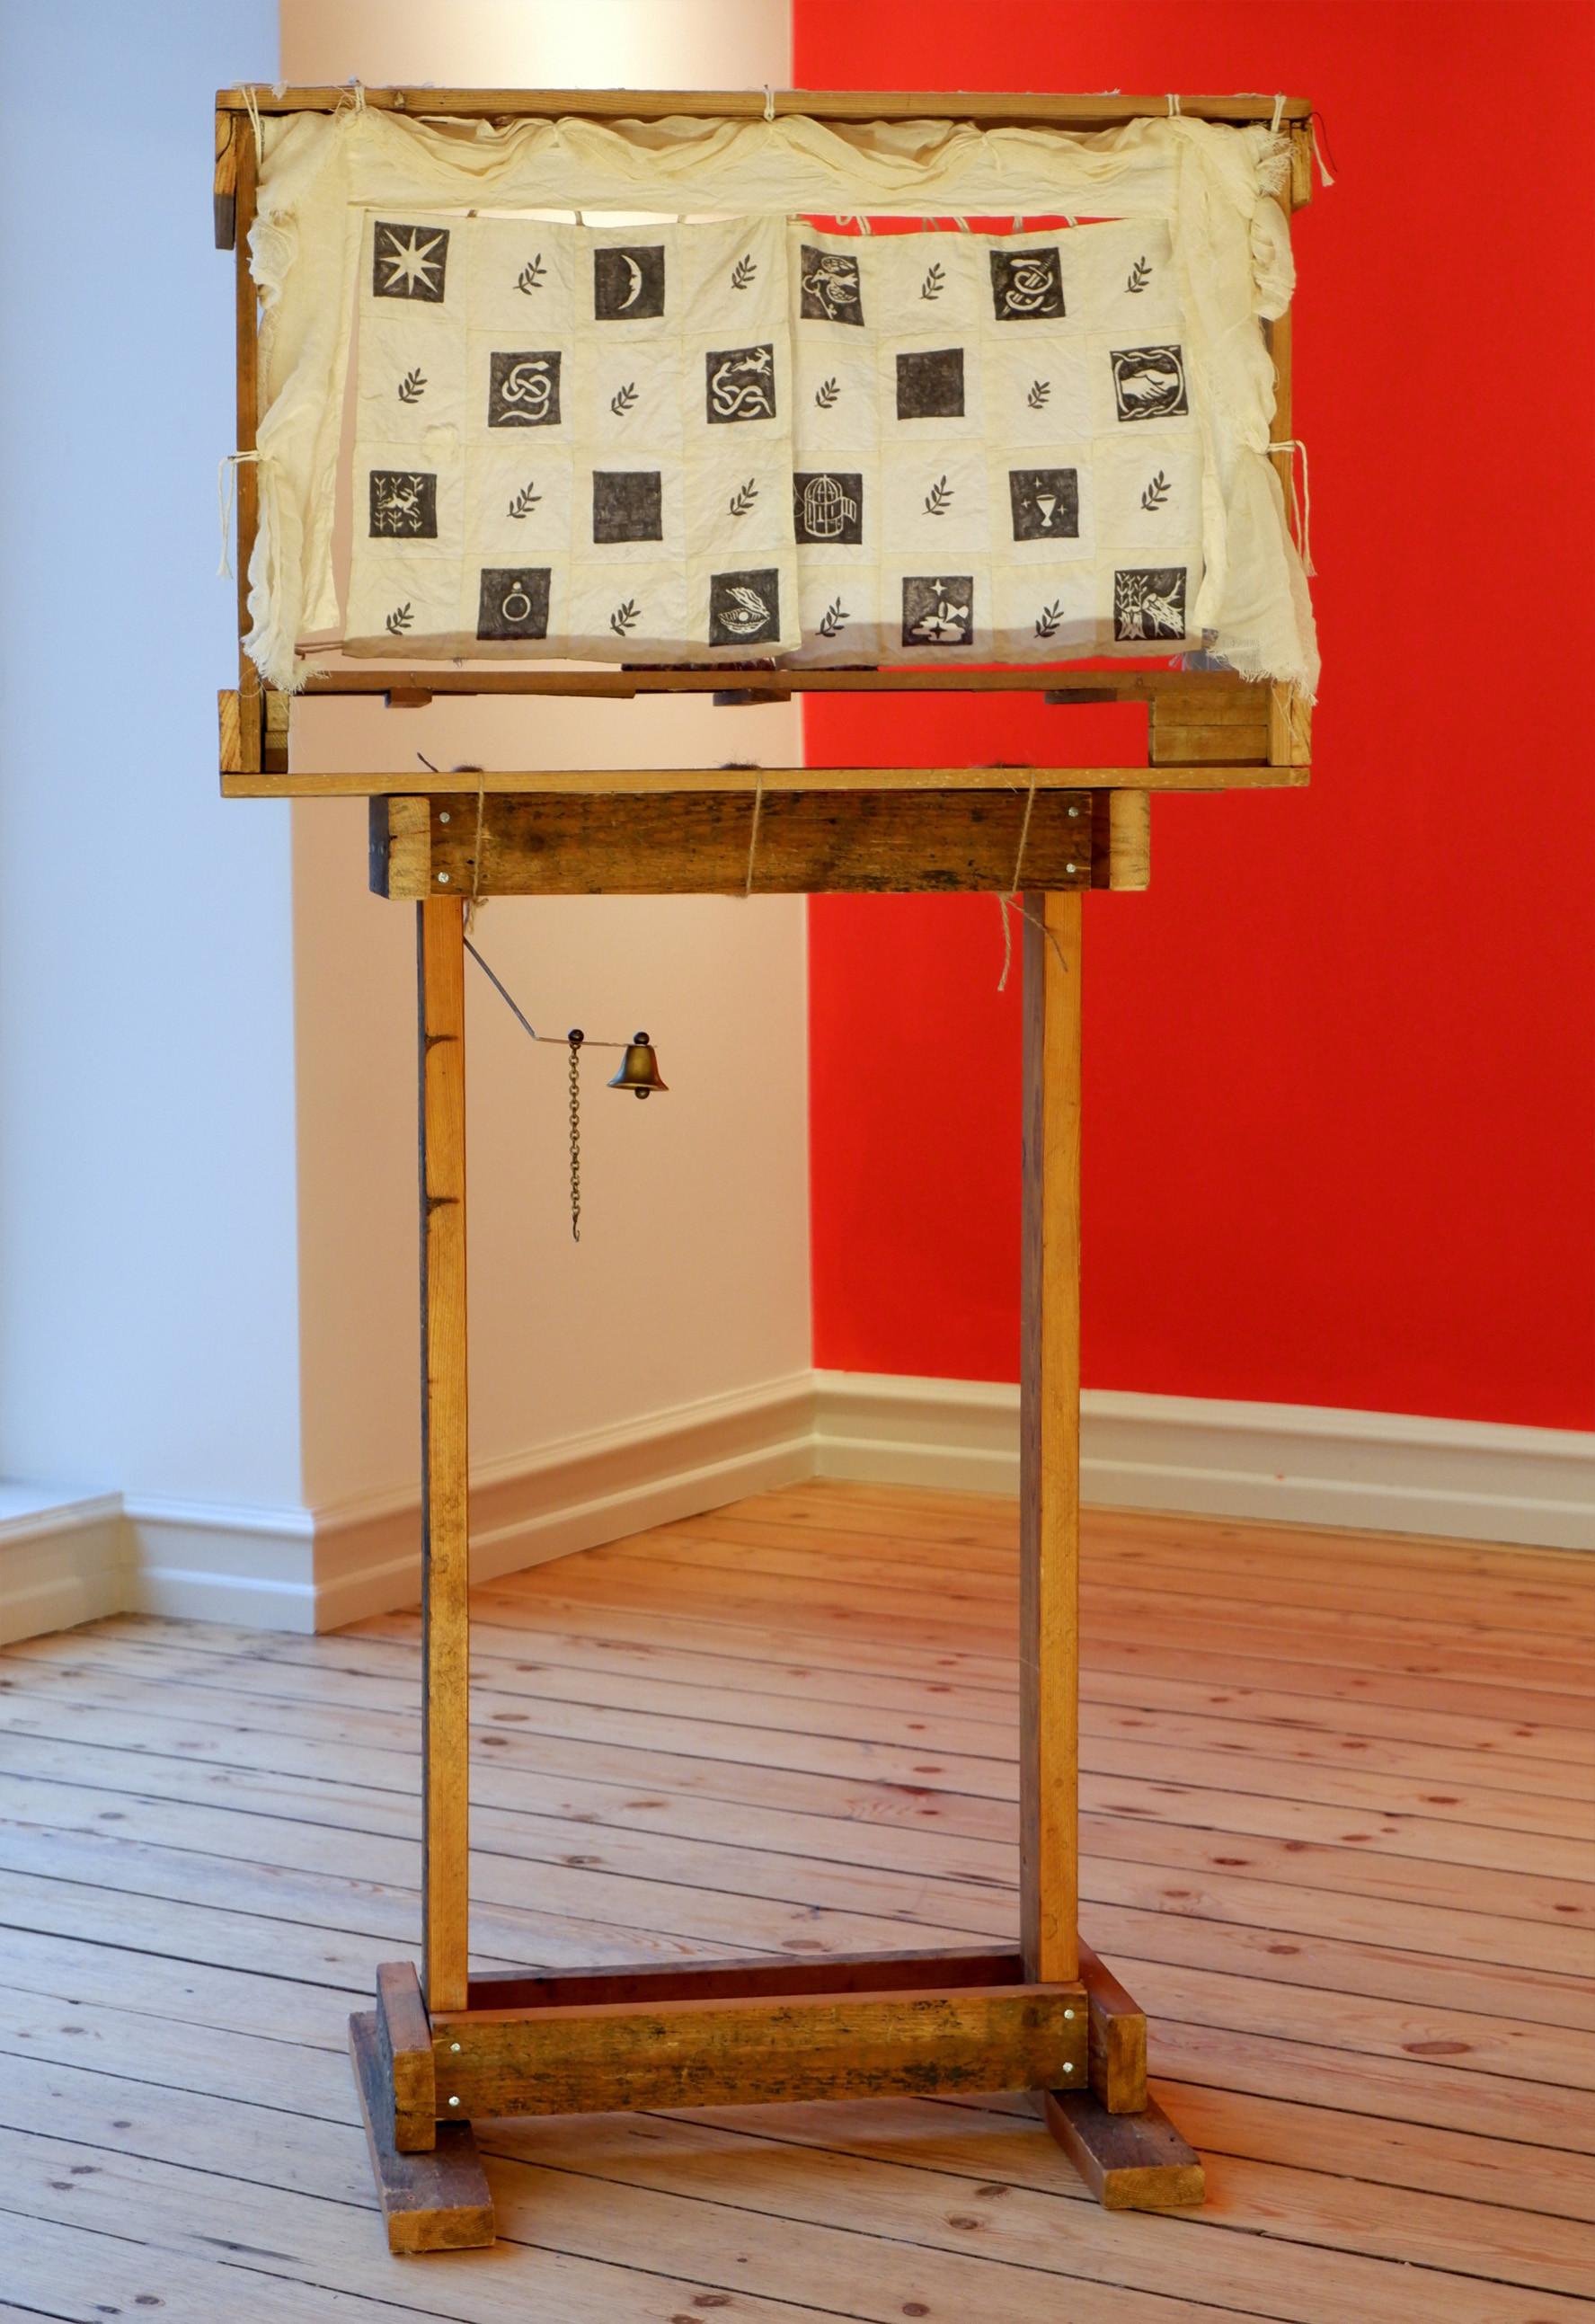 Albin Werle Tröskel, Tröskel, 2020 Wood, string, cotton, ink, brass bell, roses 22x63x122 cm